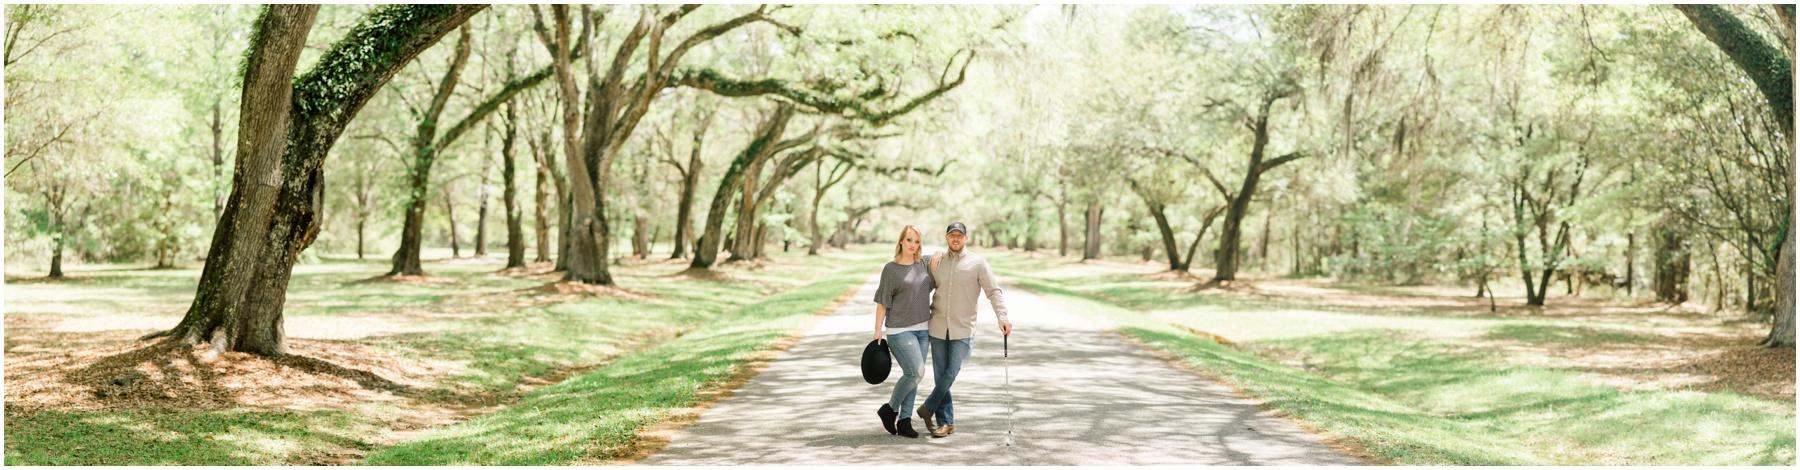 Mepkin-Abbey-Moncks-Corner-South-Carolina-Engagement-Session-Photos_0027.jpg